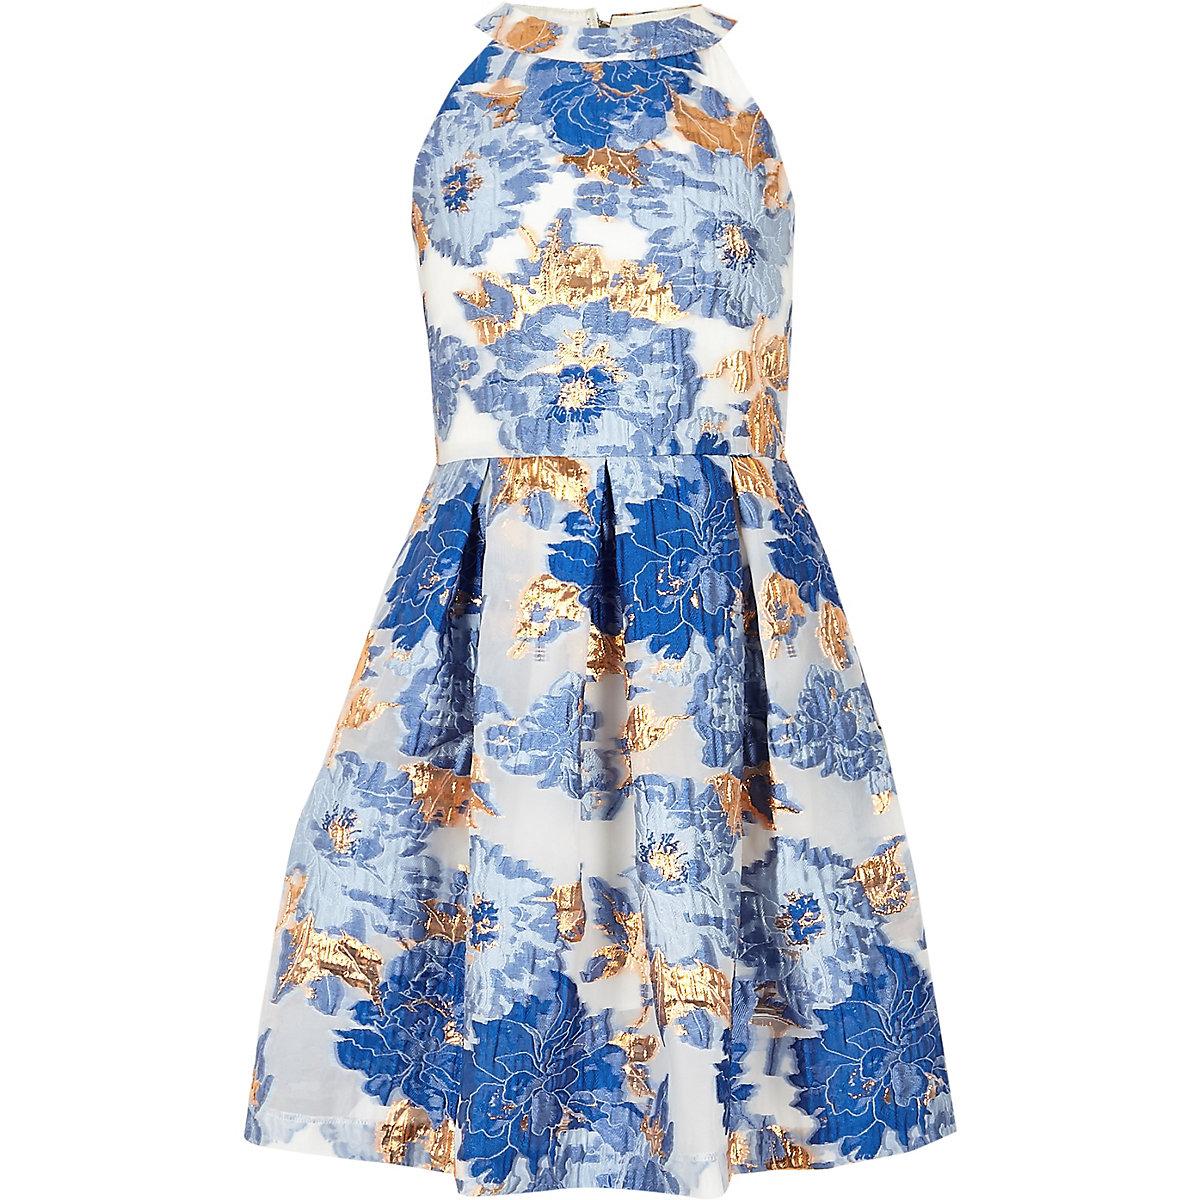 Robe de gala en jacquard bleu métallisé pour fille